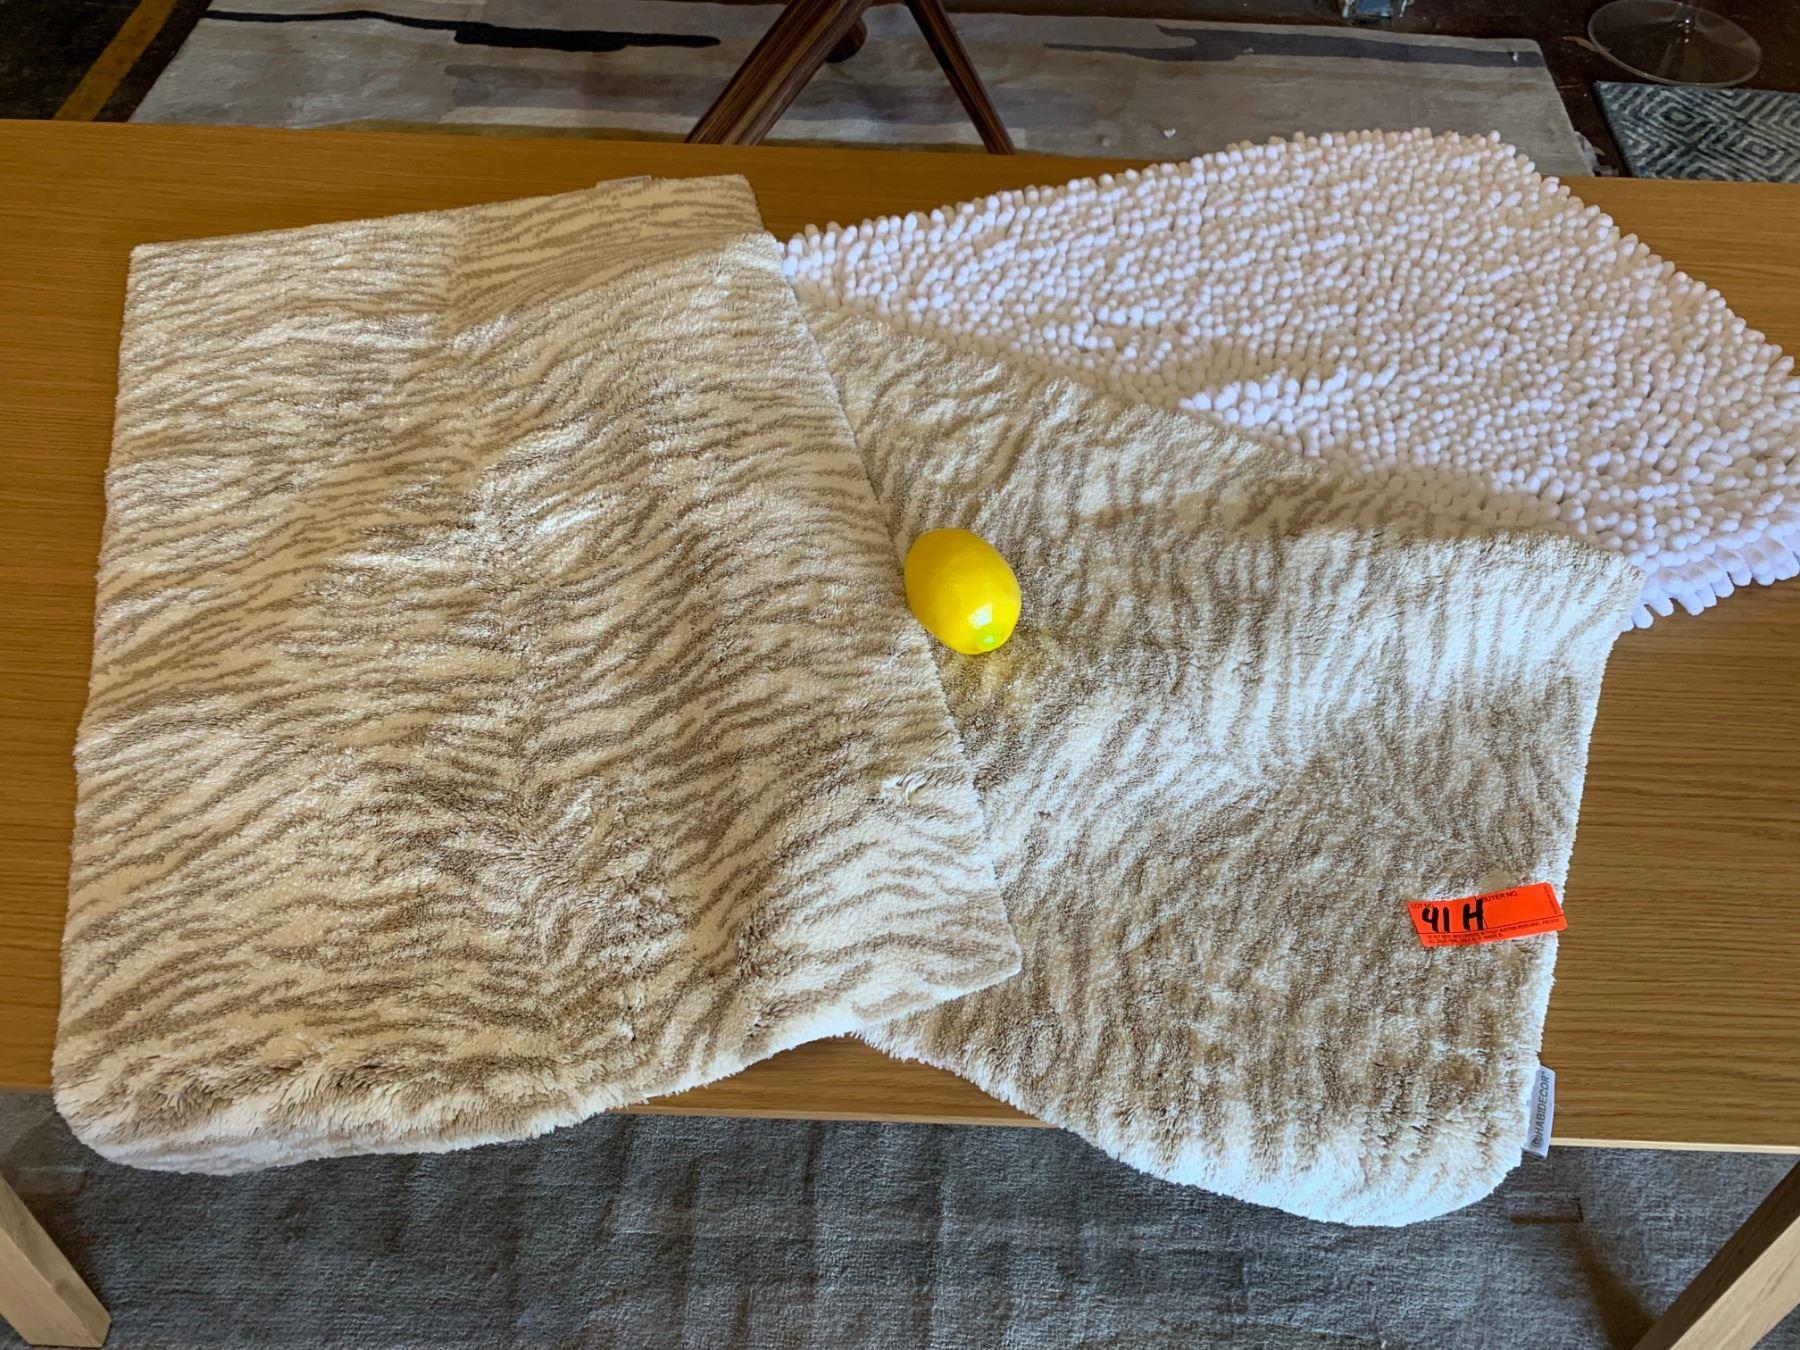 2 Habidecor Animal Print Bath Rugs 1 Plush White Pompom Bath Rug Oahu Auctions